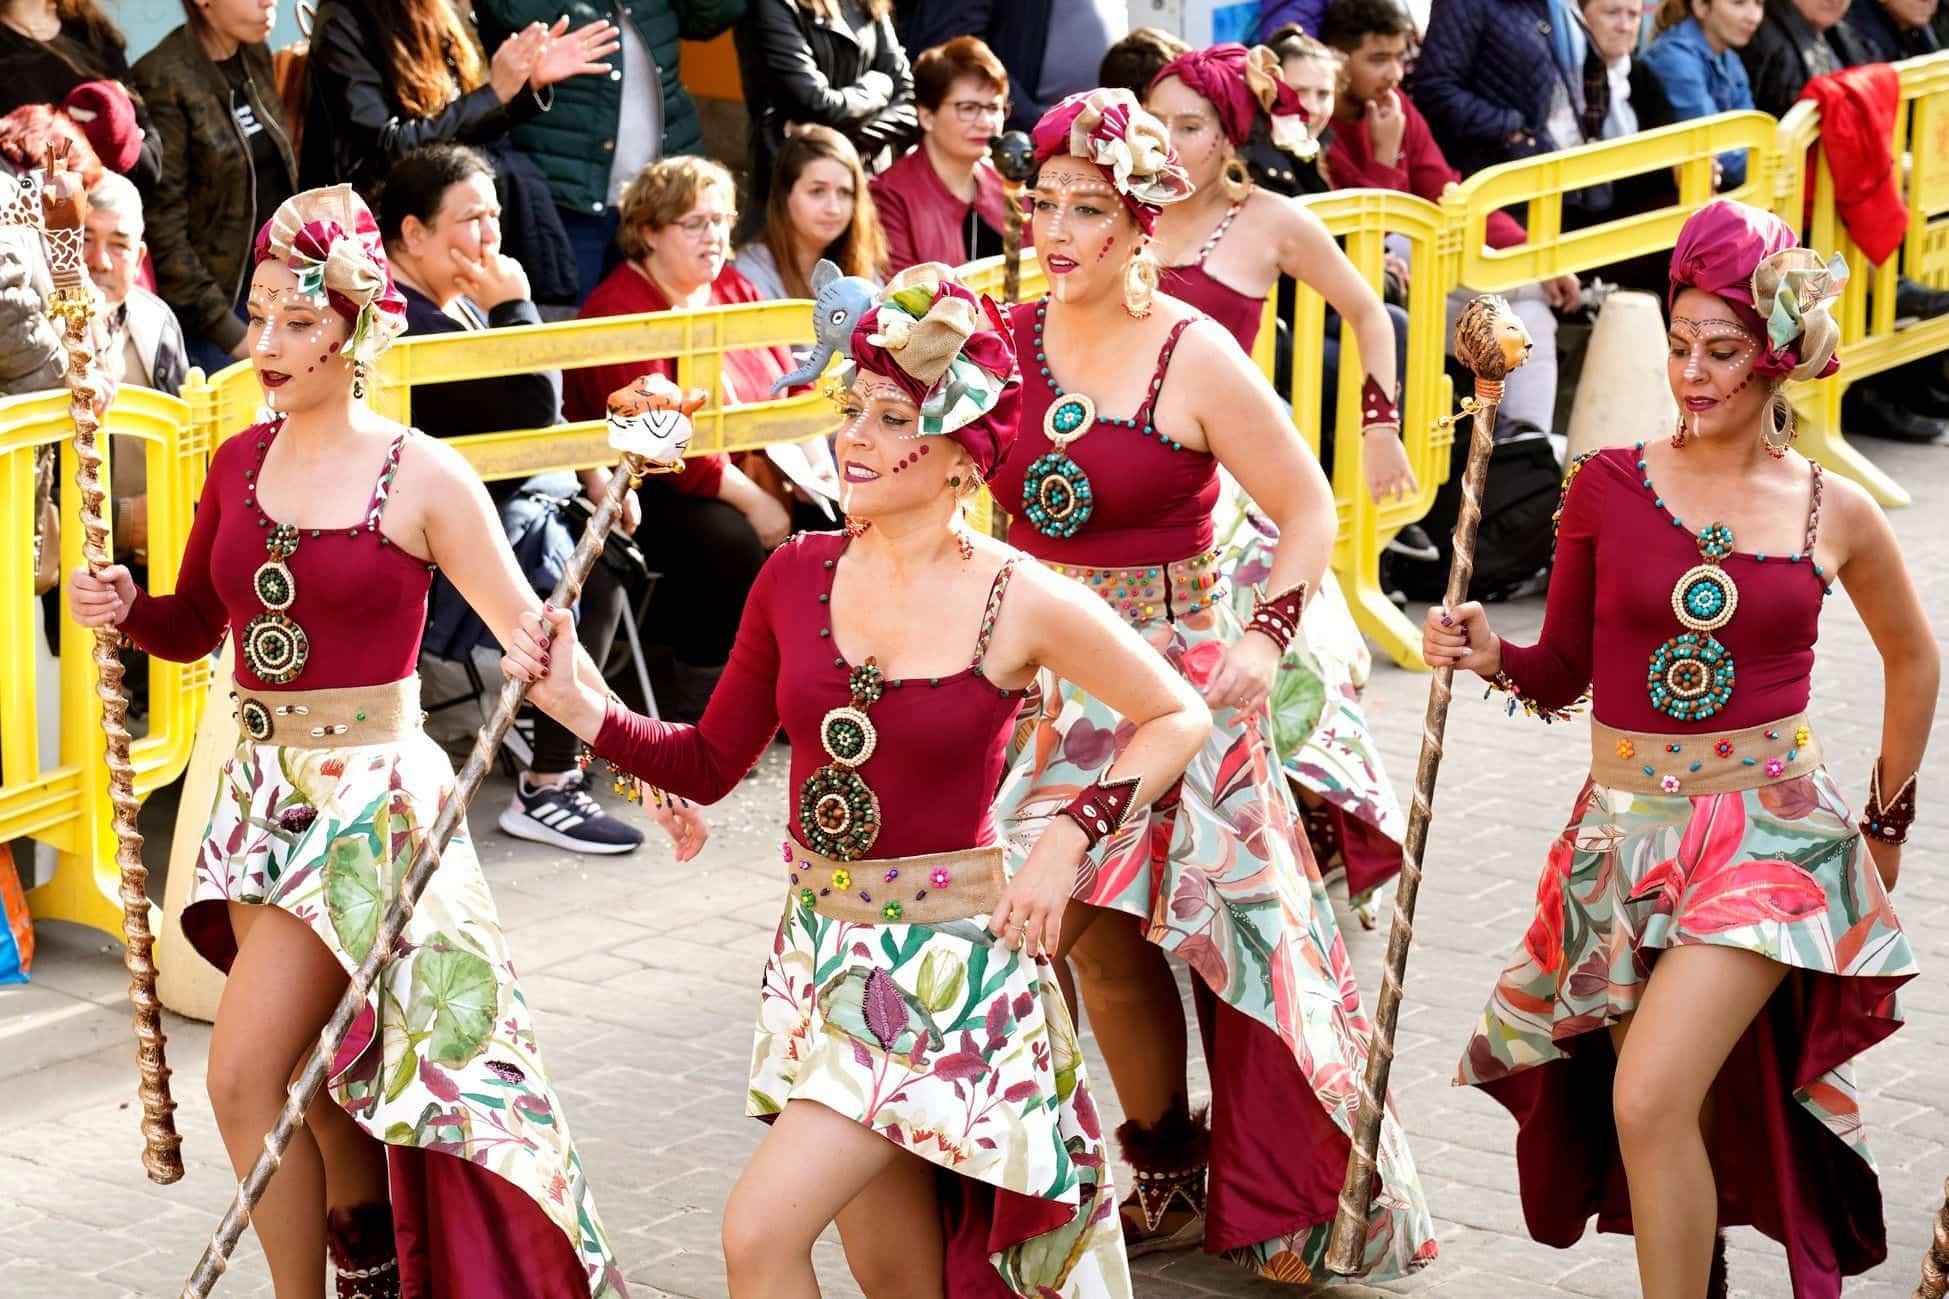 Carnaval de herencia 2020 ofertorio 24 - Selección de fotografías del Ofertorio del Carnaval de Herencia